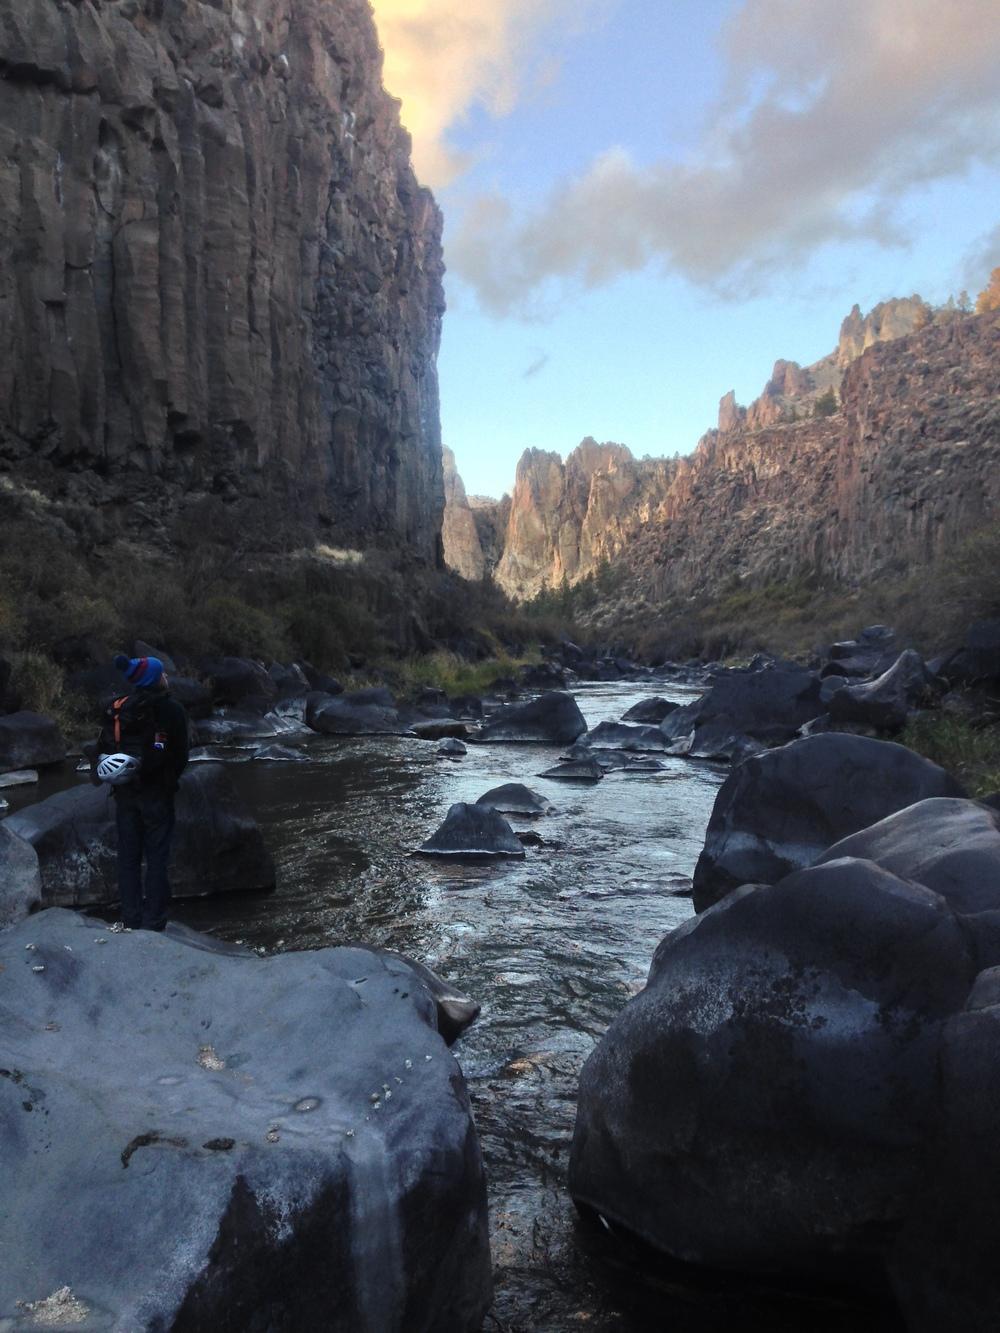 Lower Gorge, Smith Rock